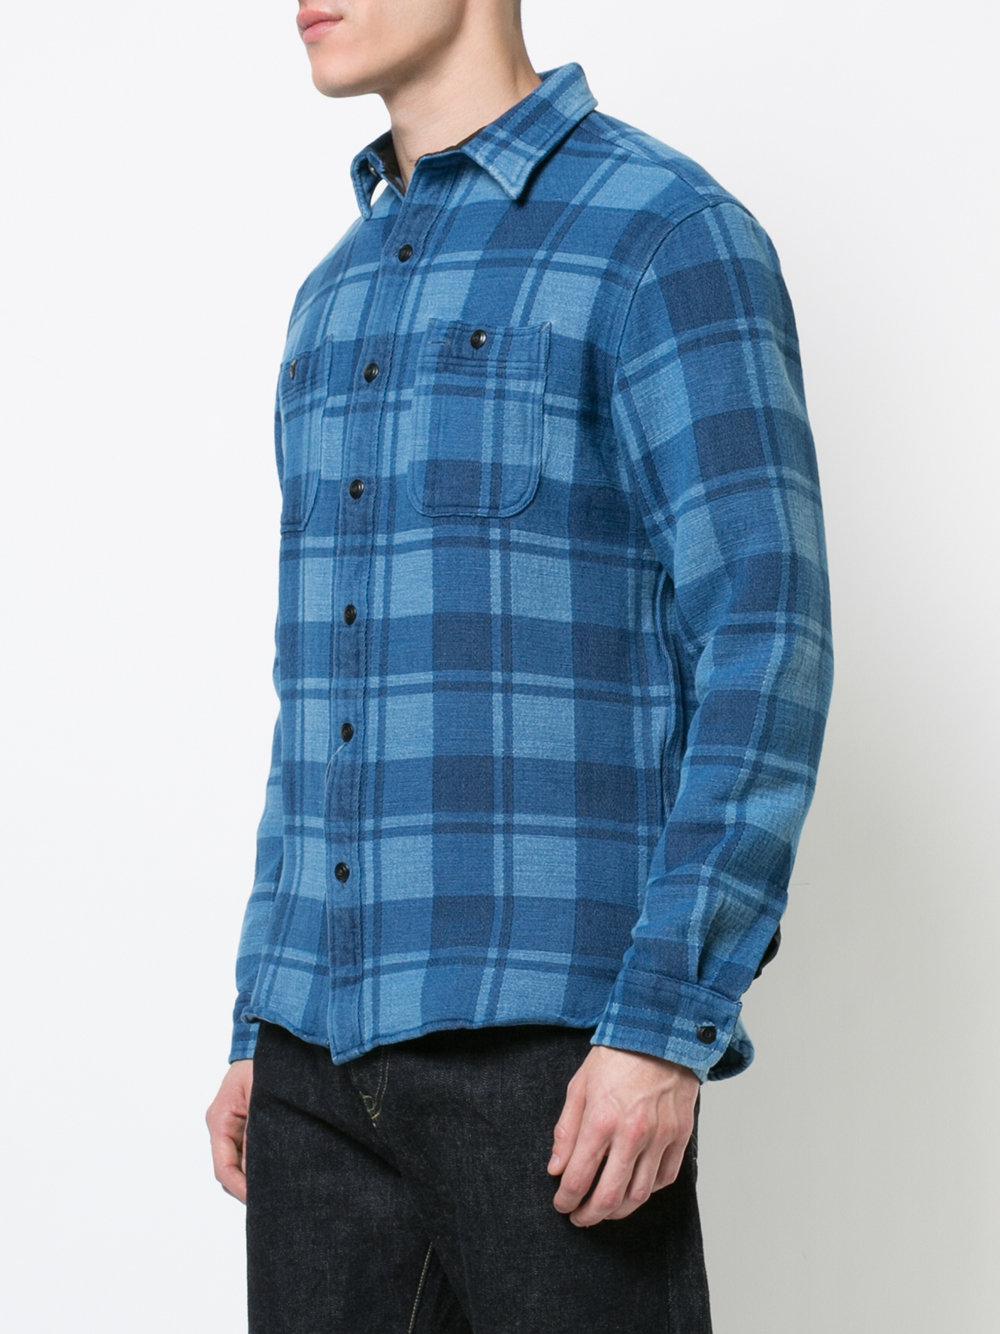 RRL Cotton Long Sleeve Plaid Shirt in Blue for Men